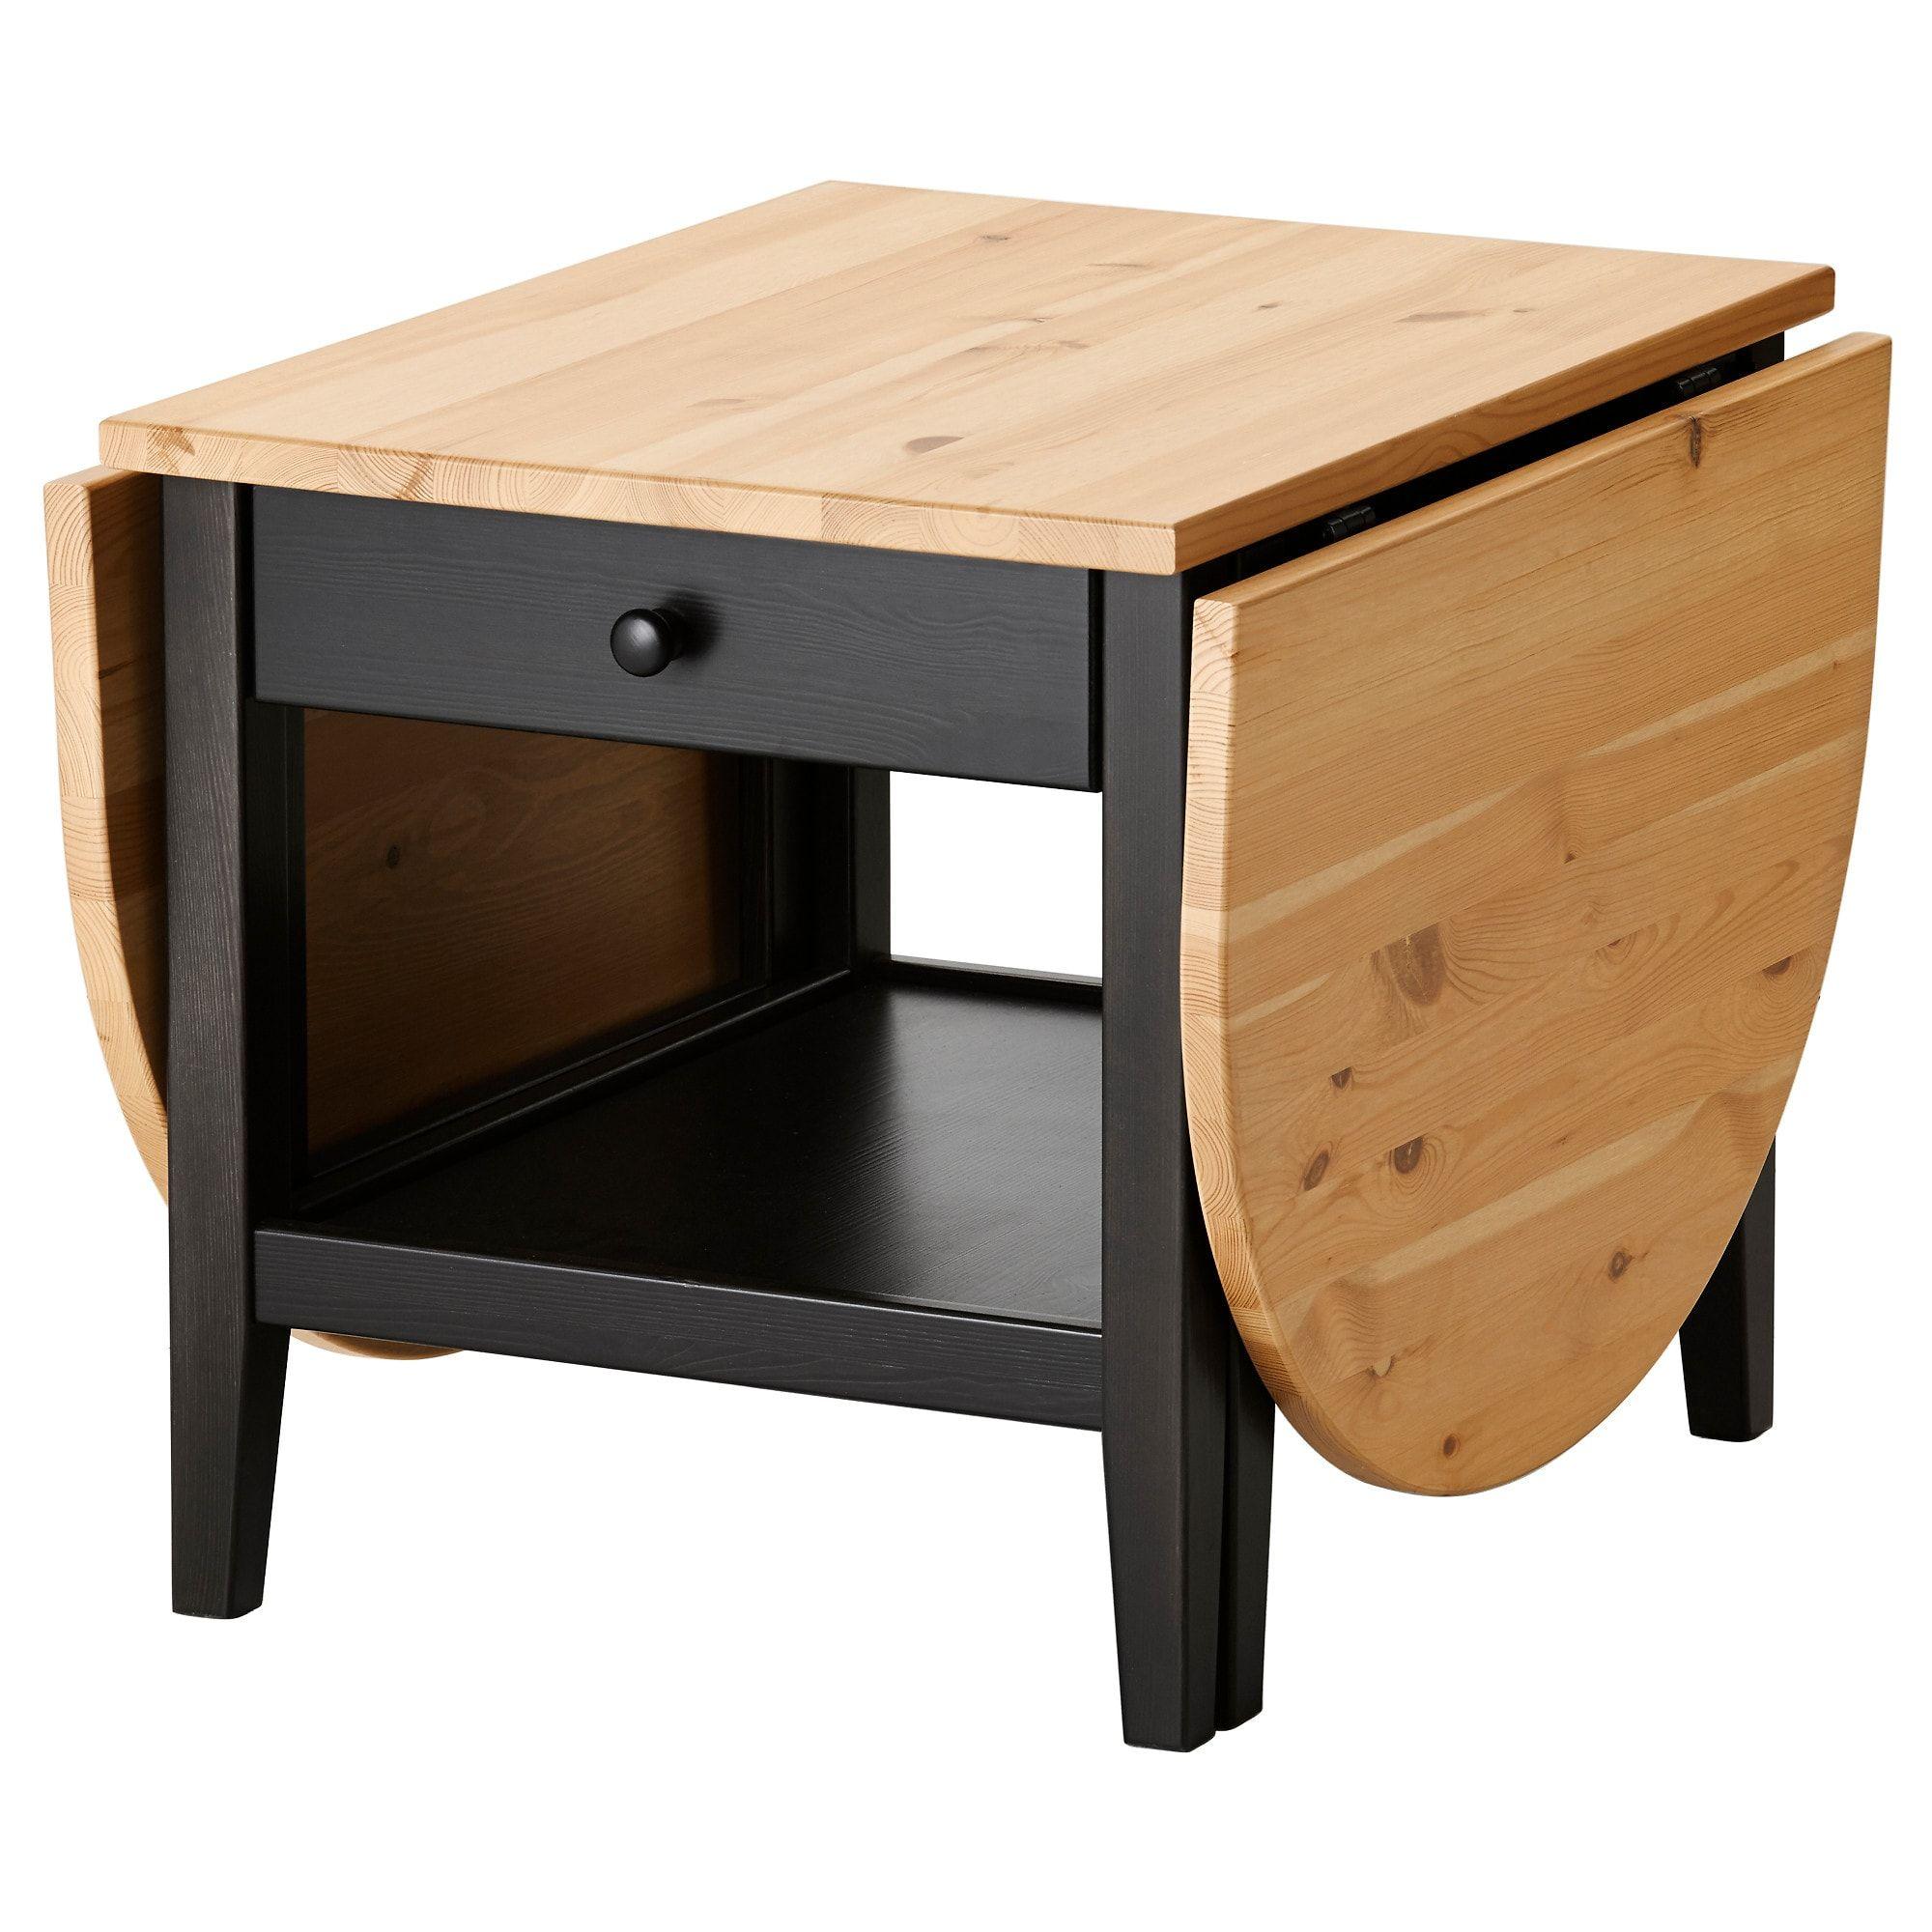 Arkelstorp Coffee Table Black Ikea Ikea Coffee Table Table Storage Ikea Side Table [ 2000 x 2000 Pixel ]